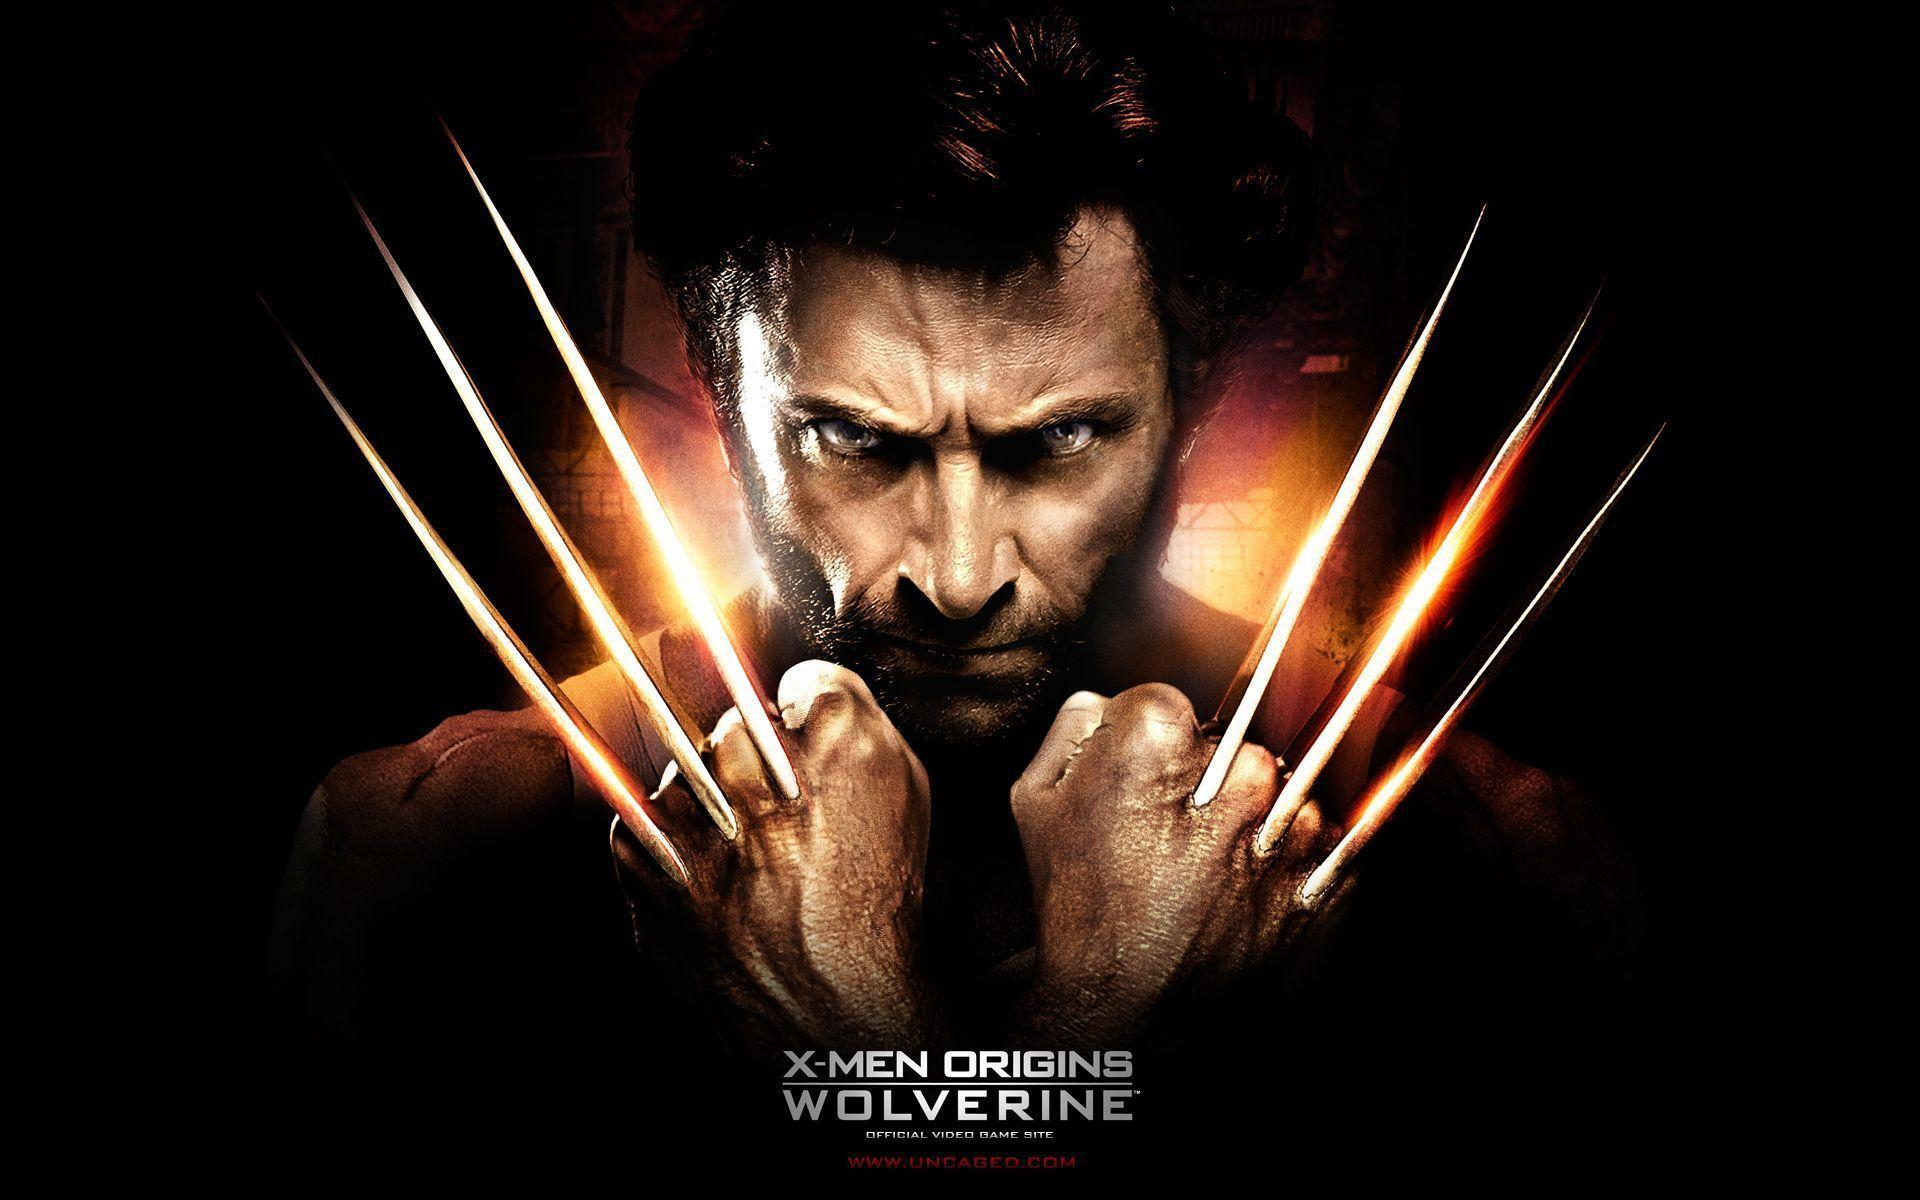 X-Men Wolverine 2015 Wallpapers - Wallpaper Cave